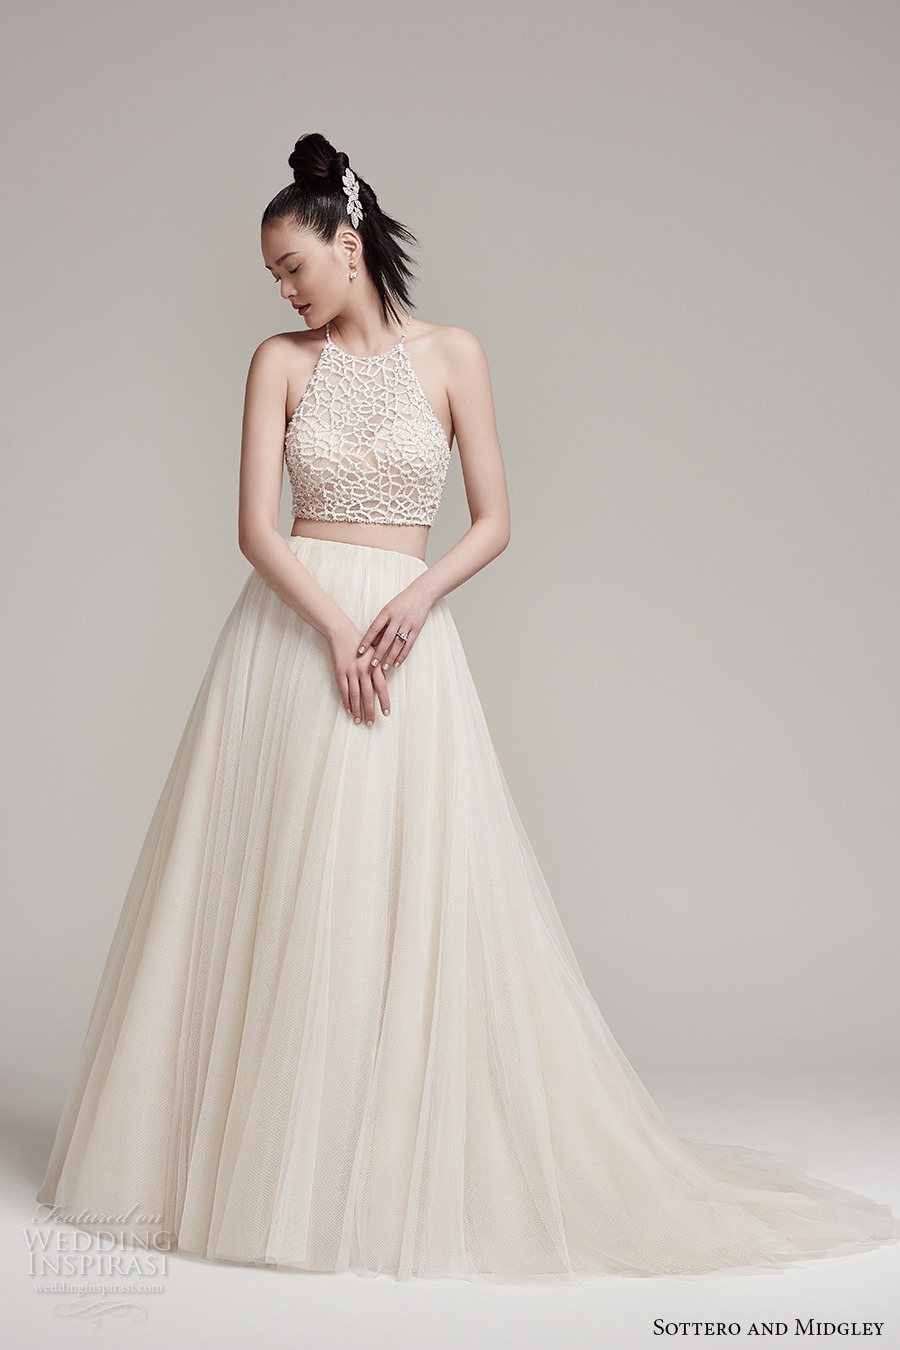 Sottero and Midgley Fall 2016 Wedding Dresses - crazyforus